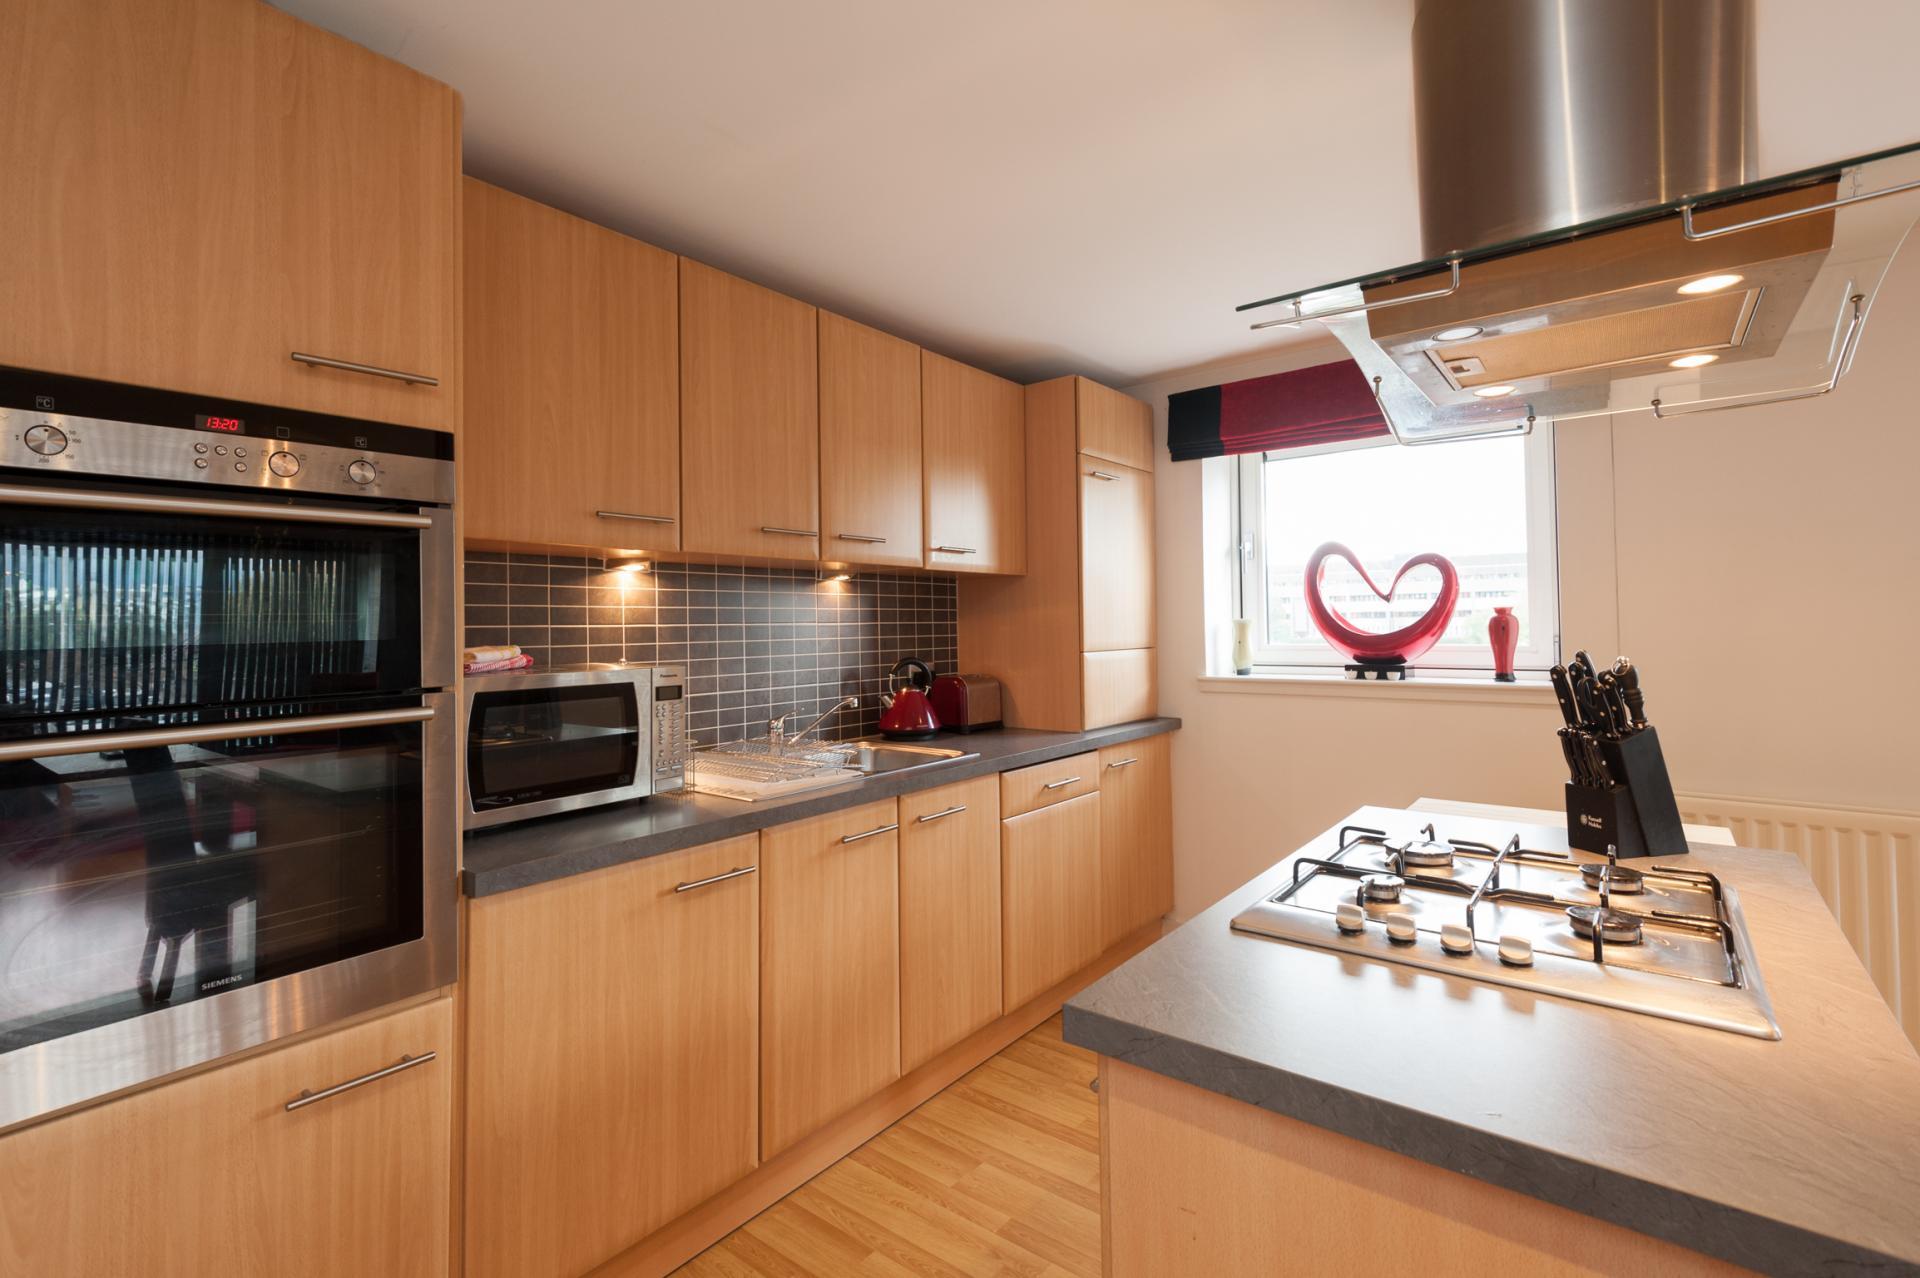 Kitchen area at Metropole Apartment